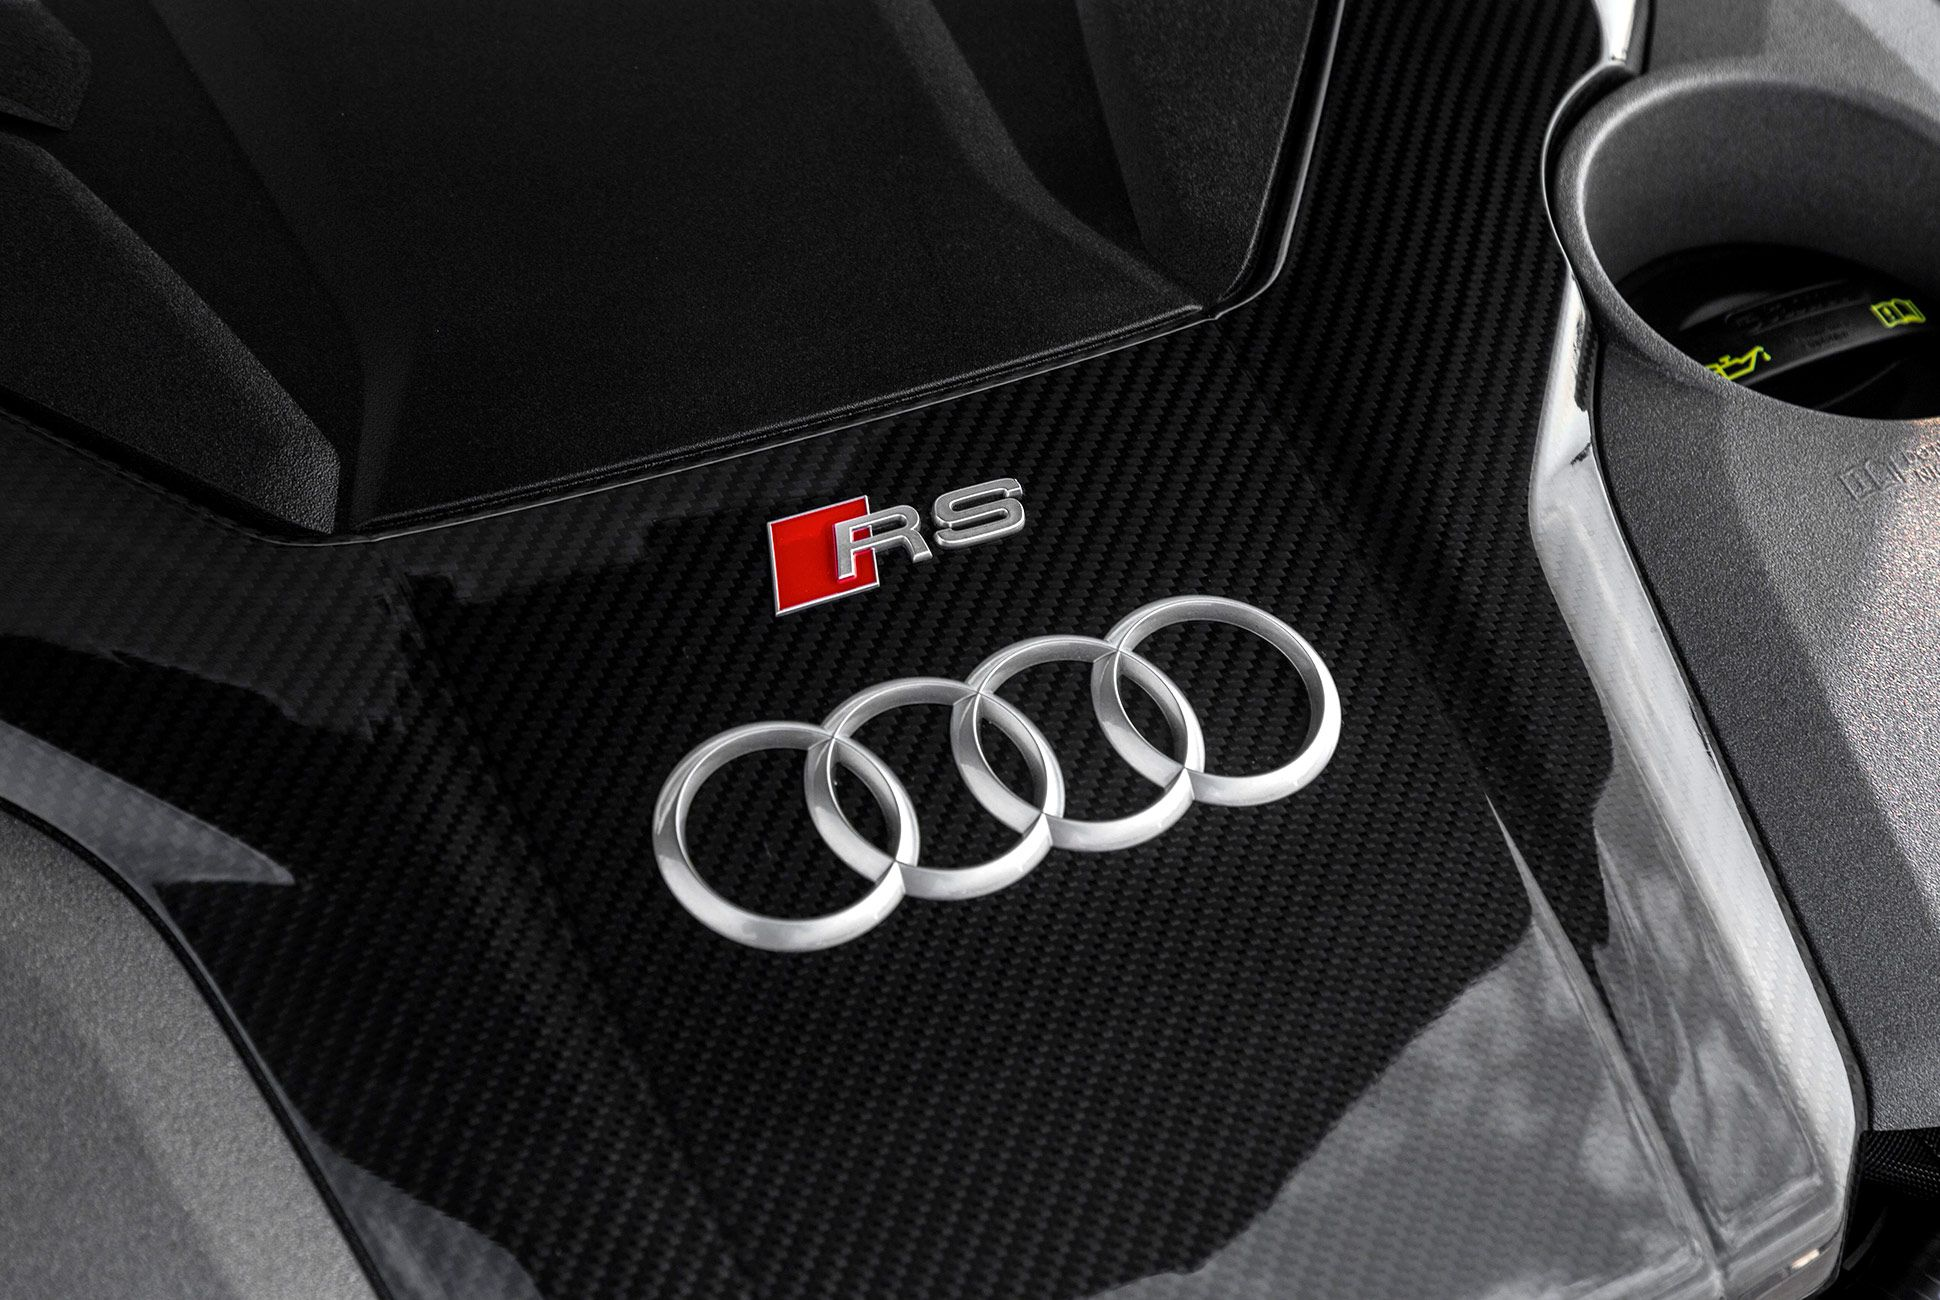 Audi-RS5-Sportback-Review-gear-patrol-slide-10